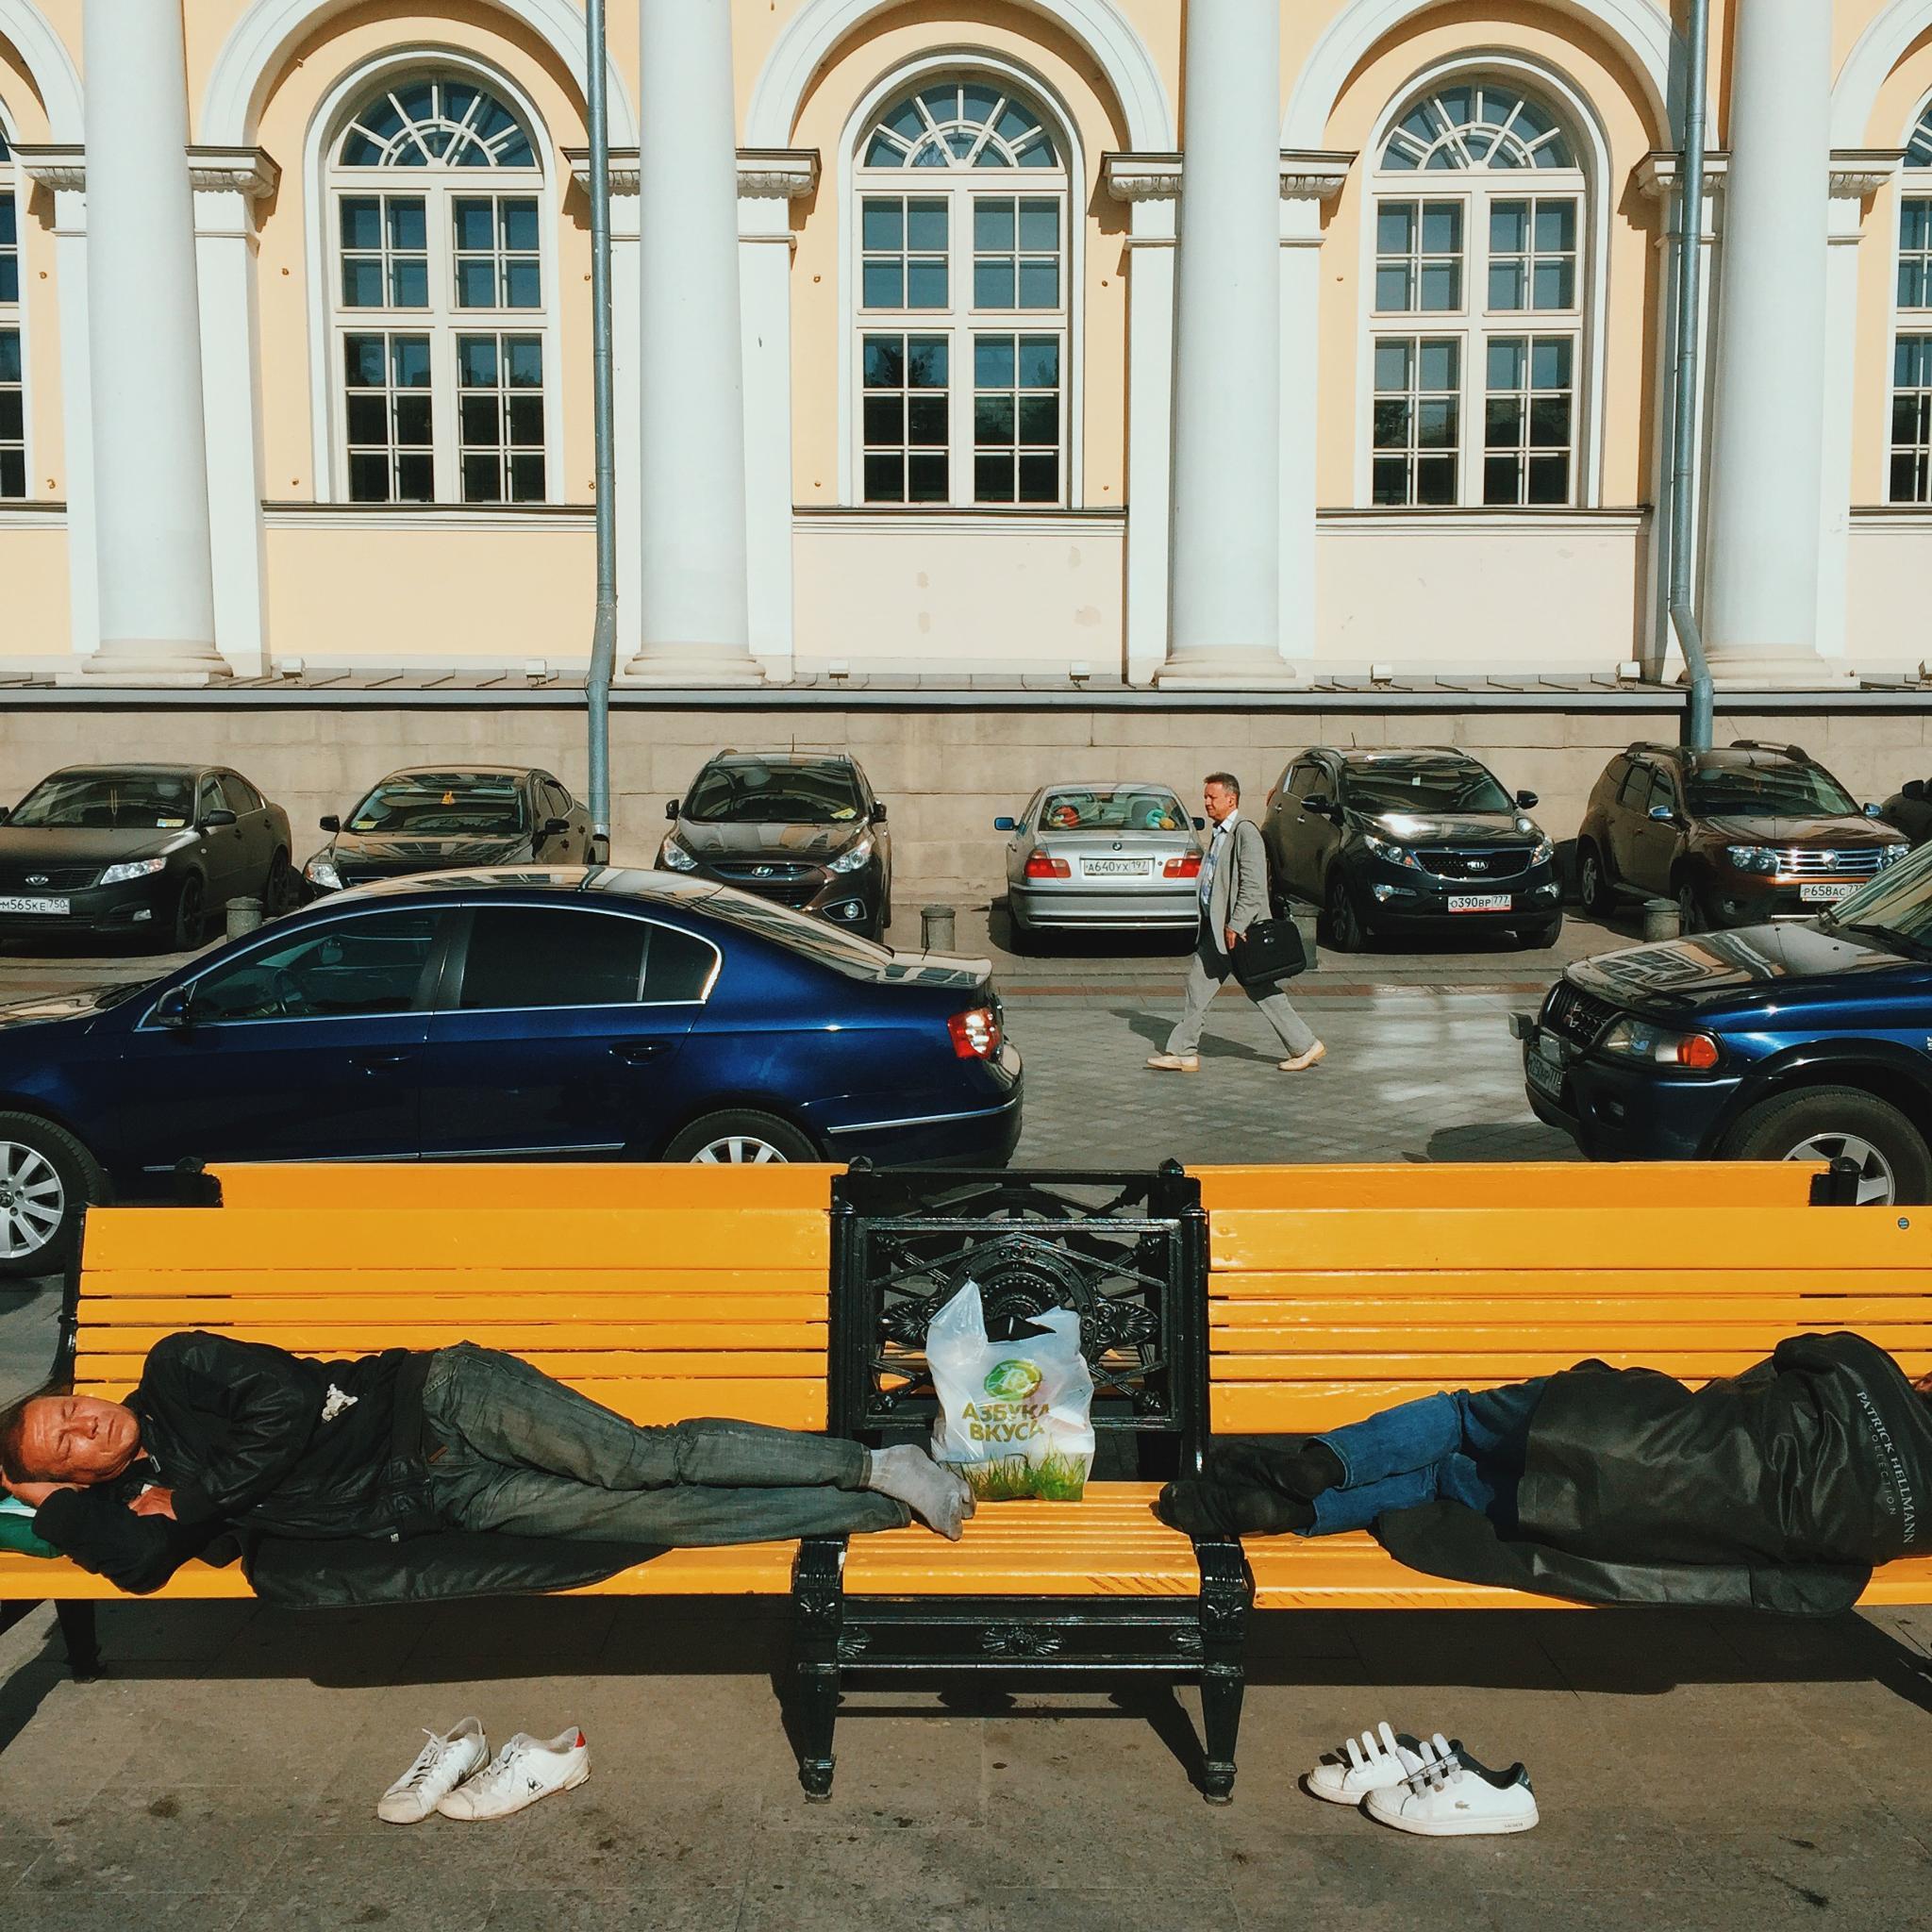 june 2015 by olga loginova